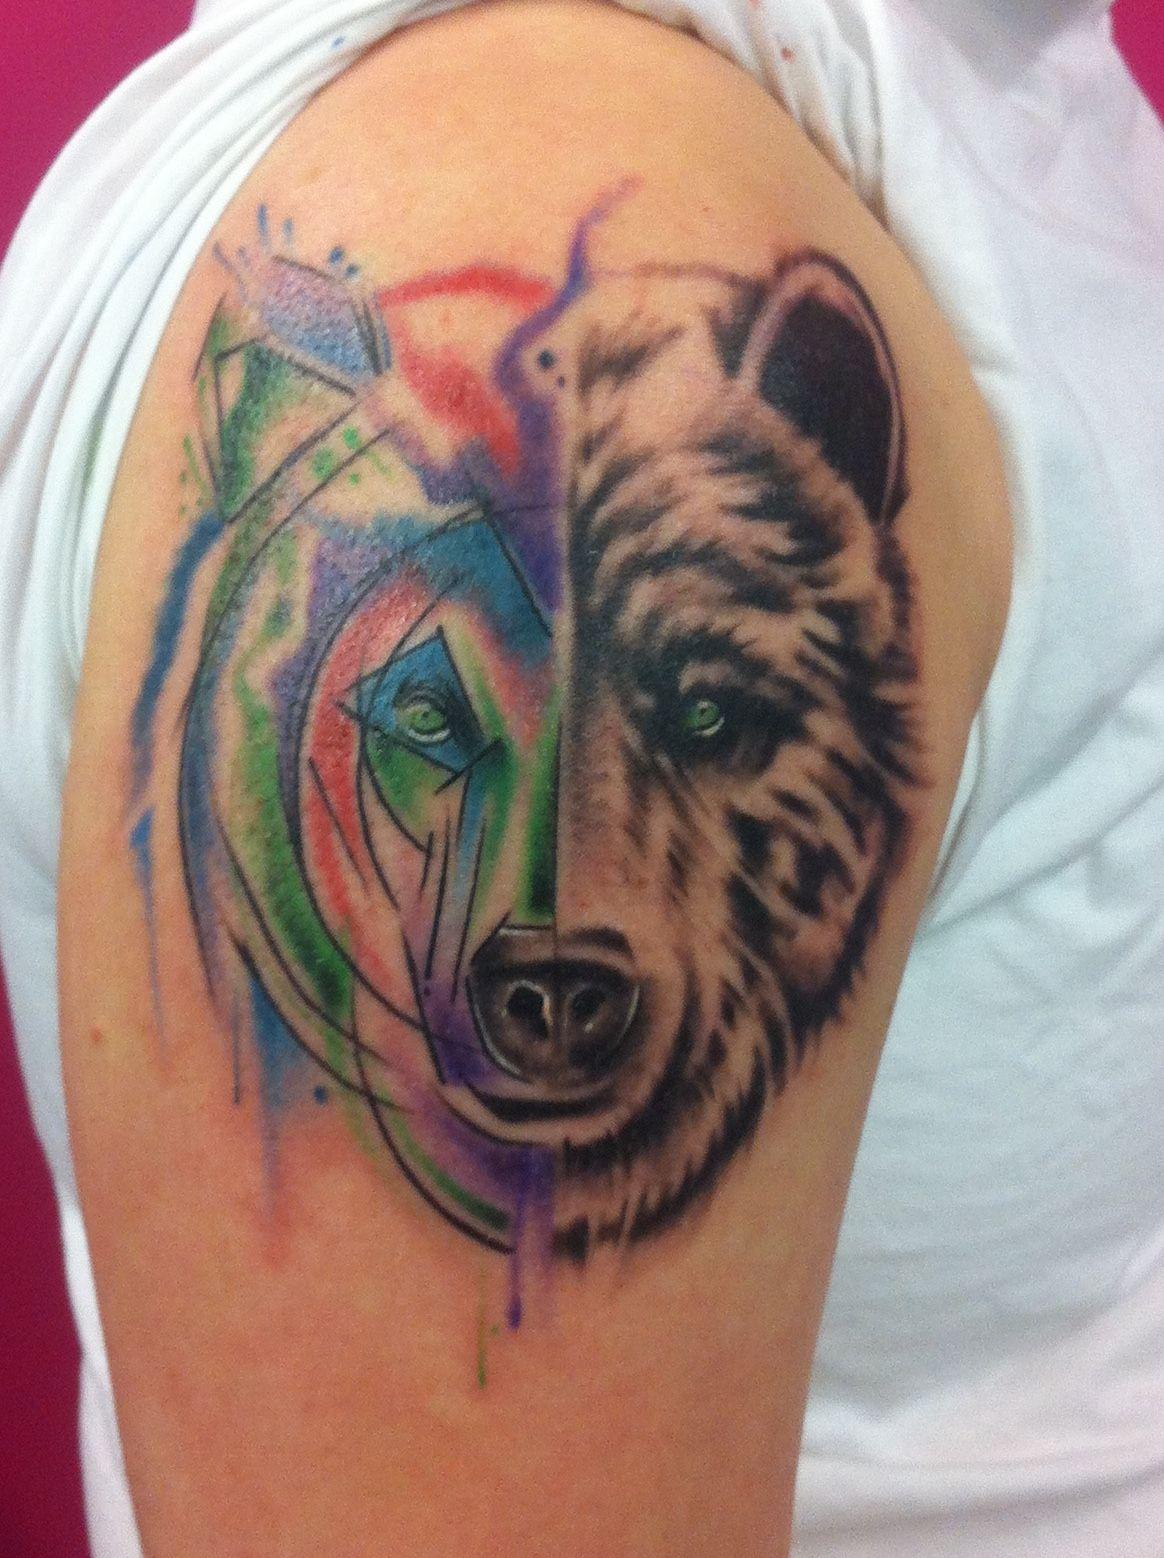 Amazing water colour realism tattoo realism tattoo